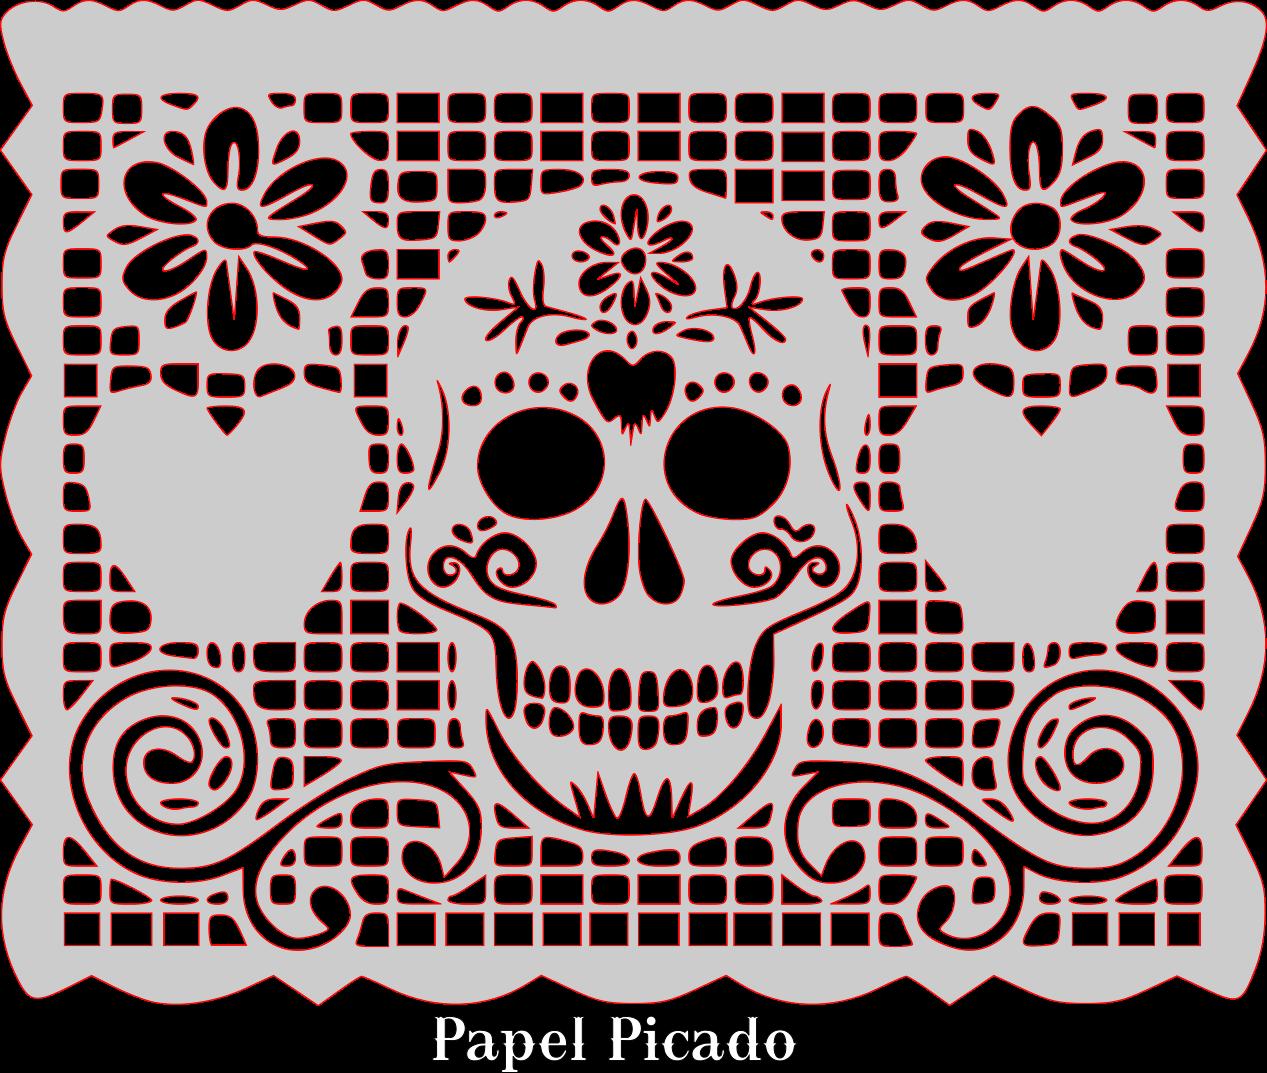 papel picado designs template - photo #2